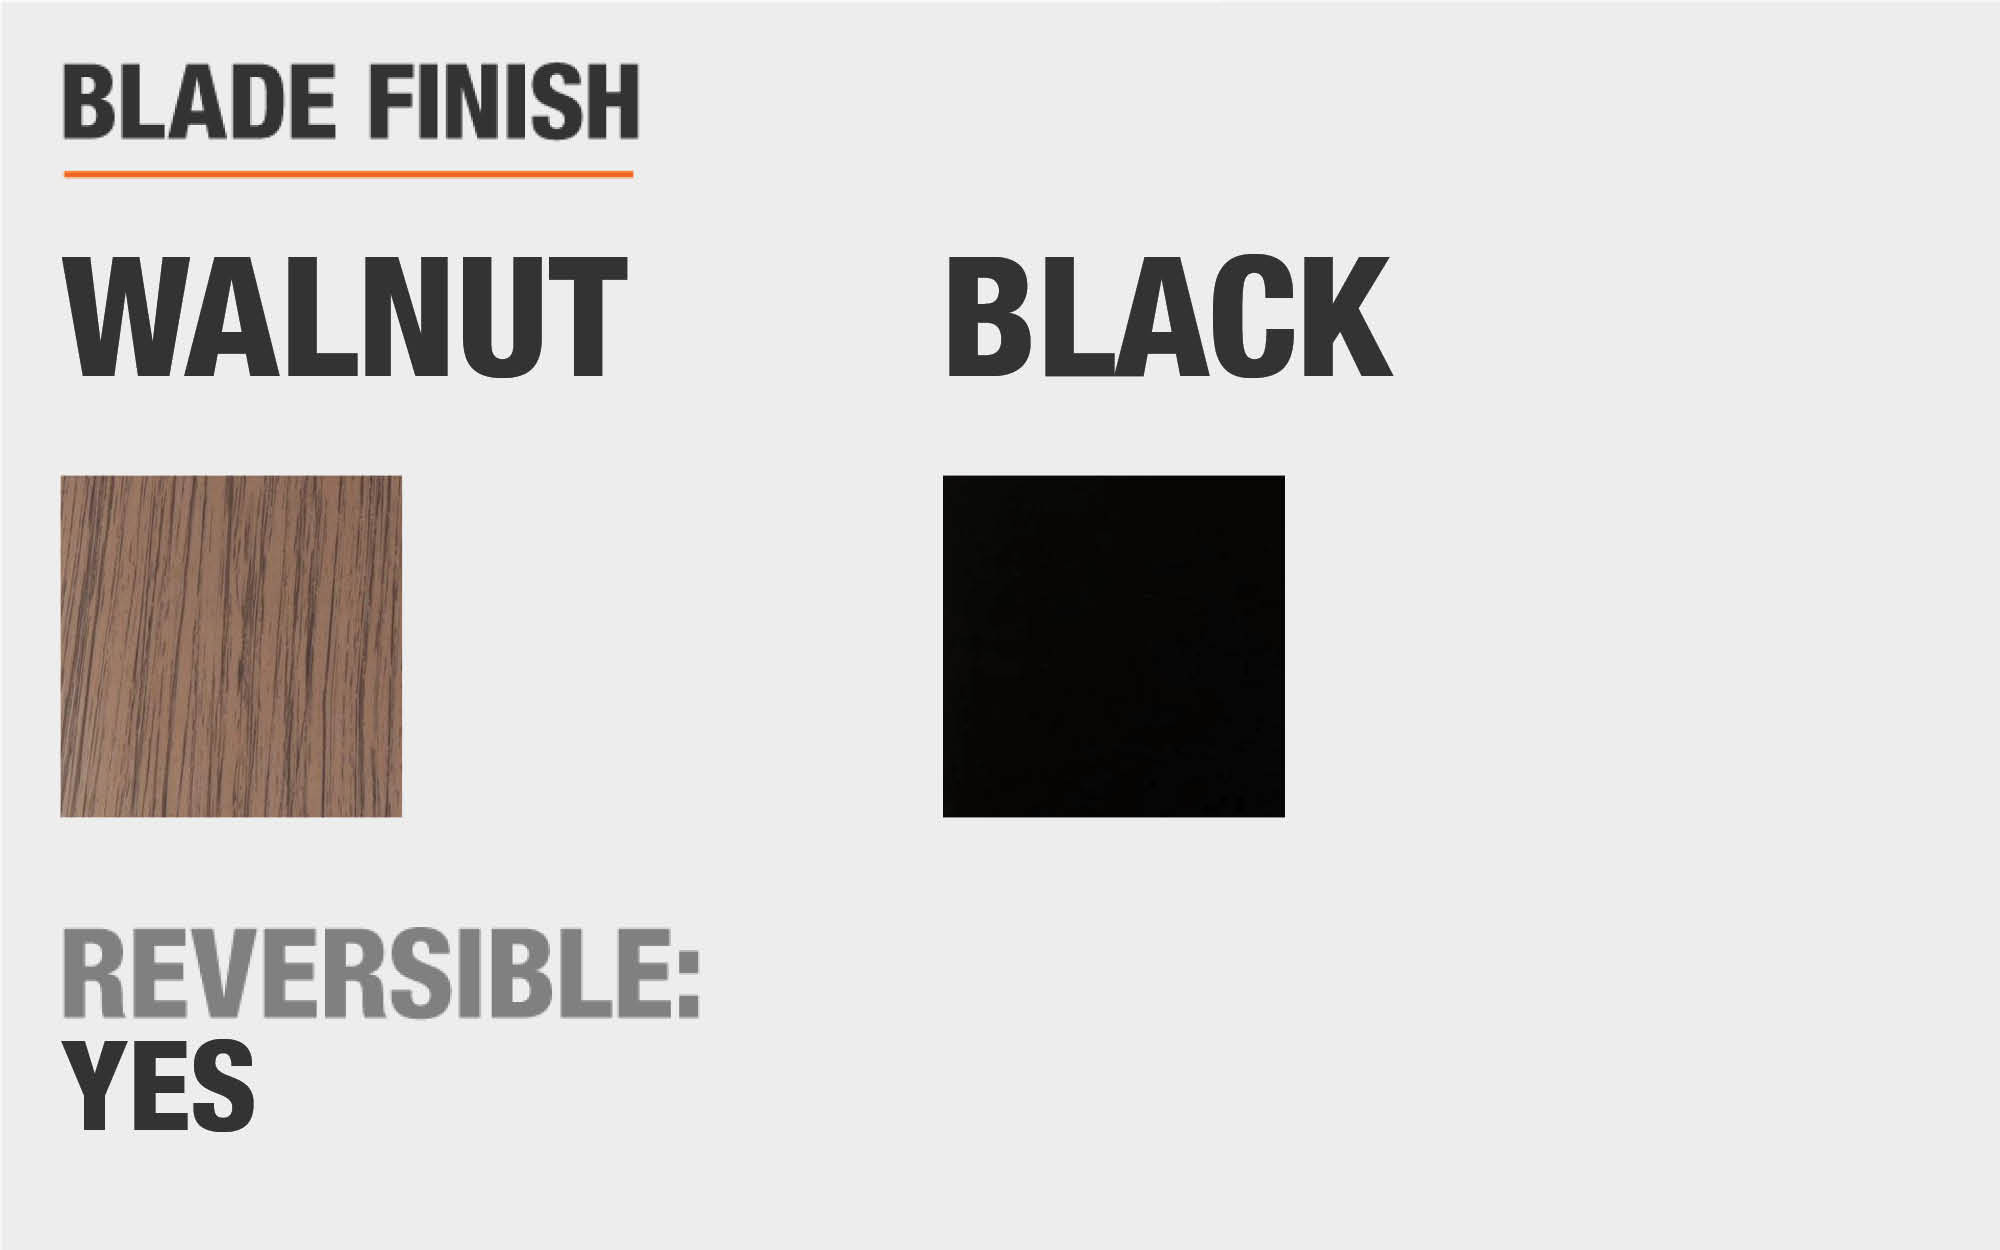 Blade finish